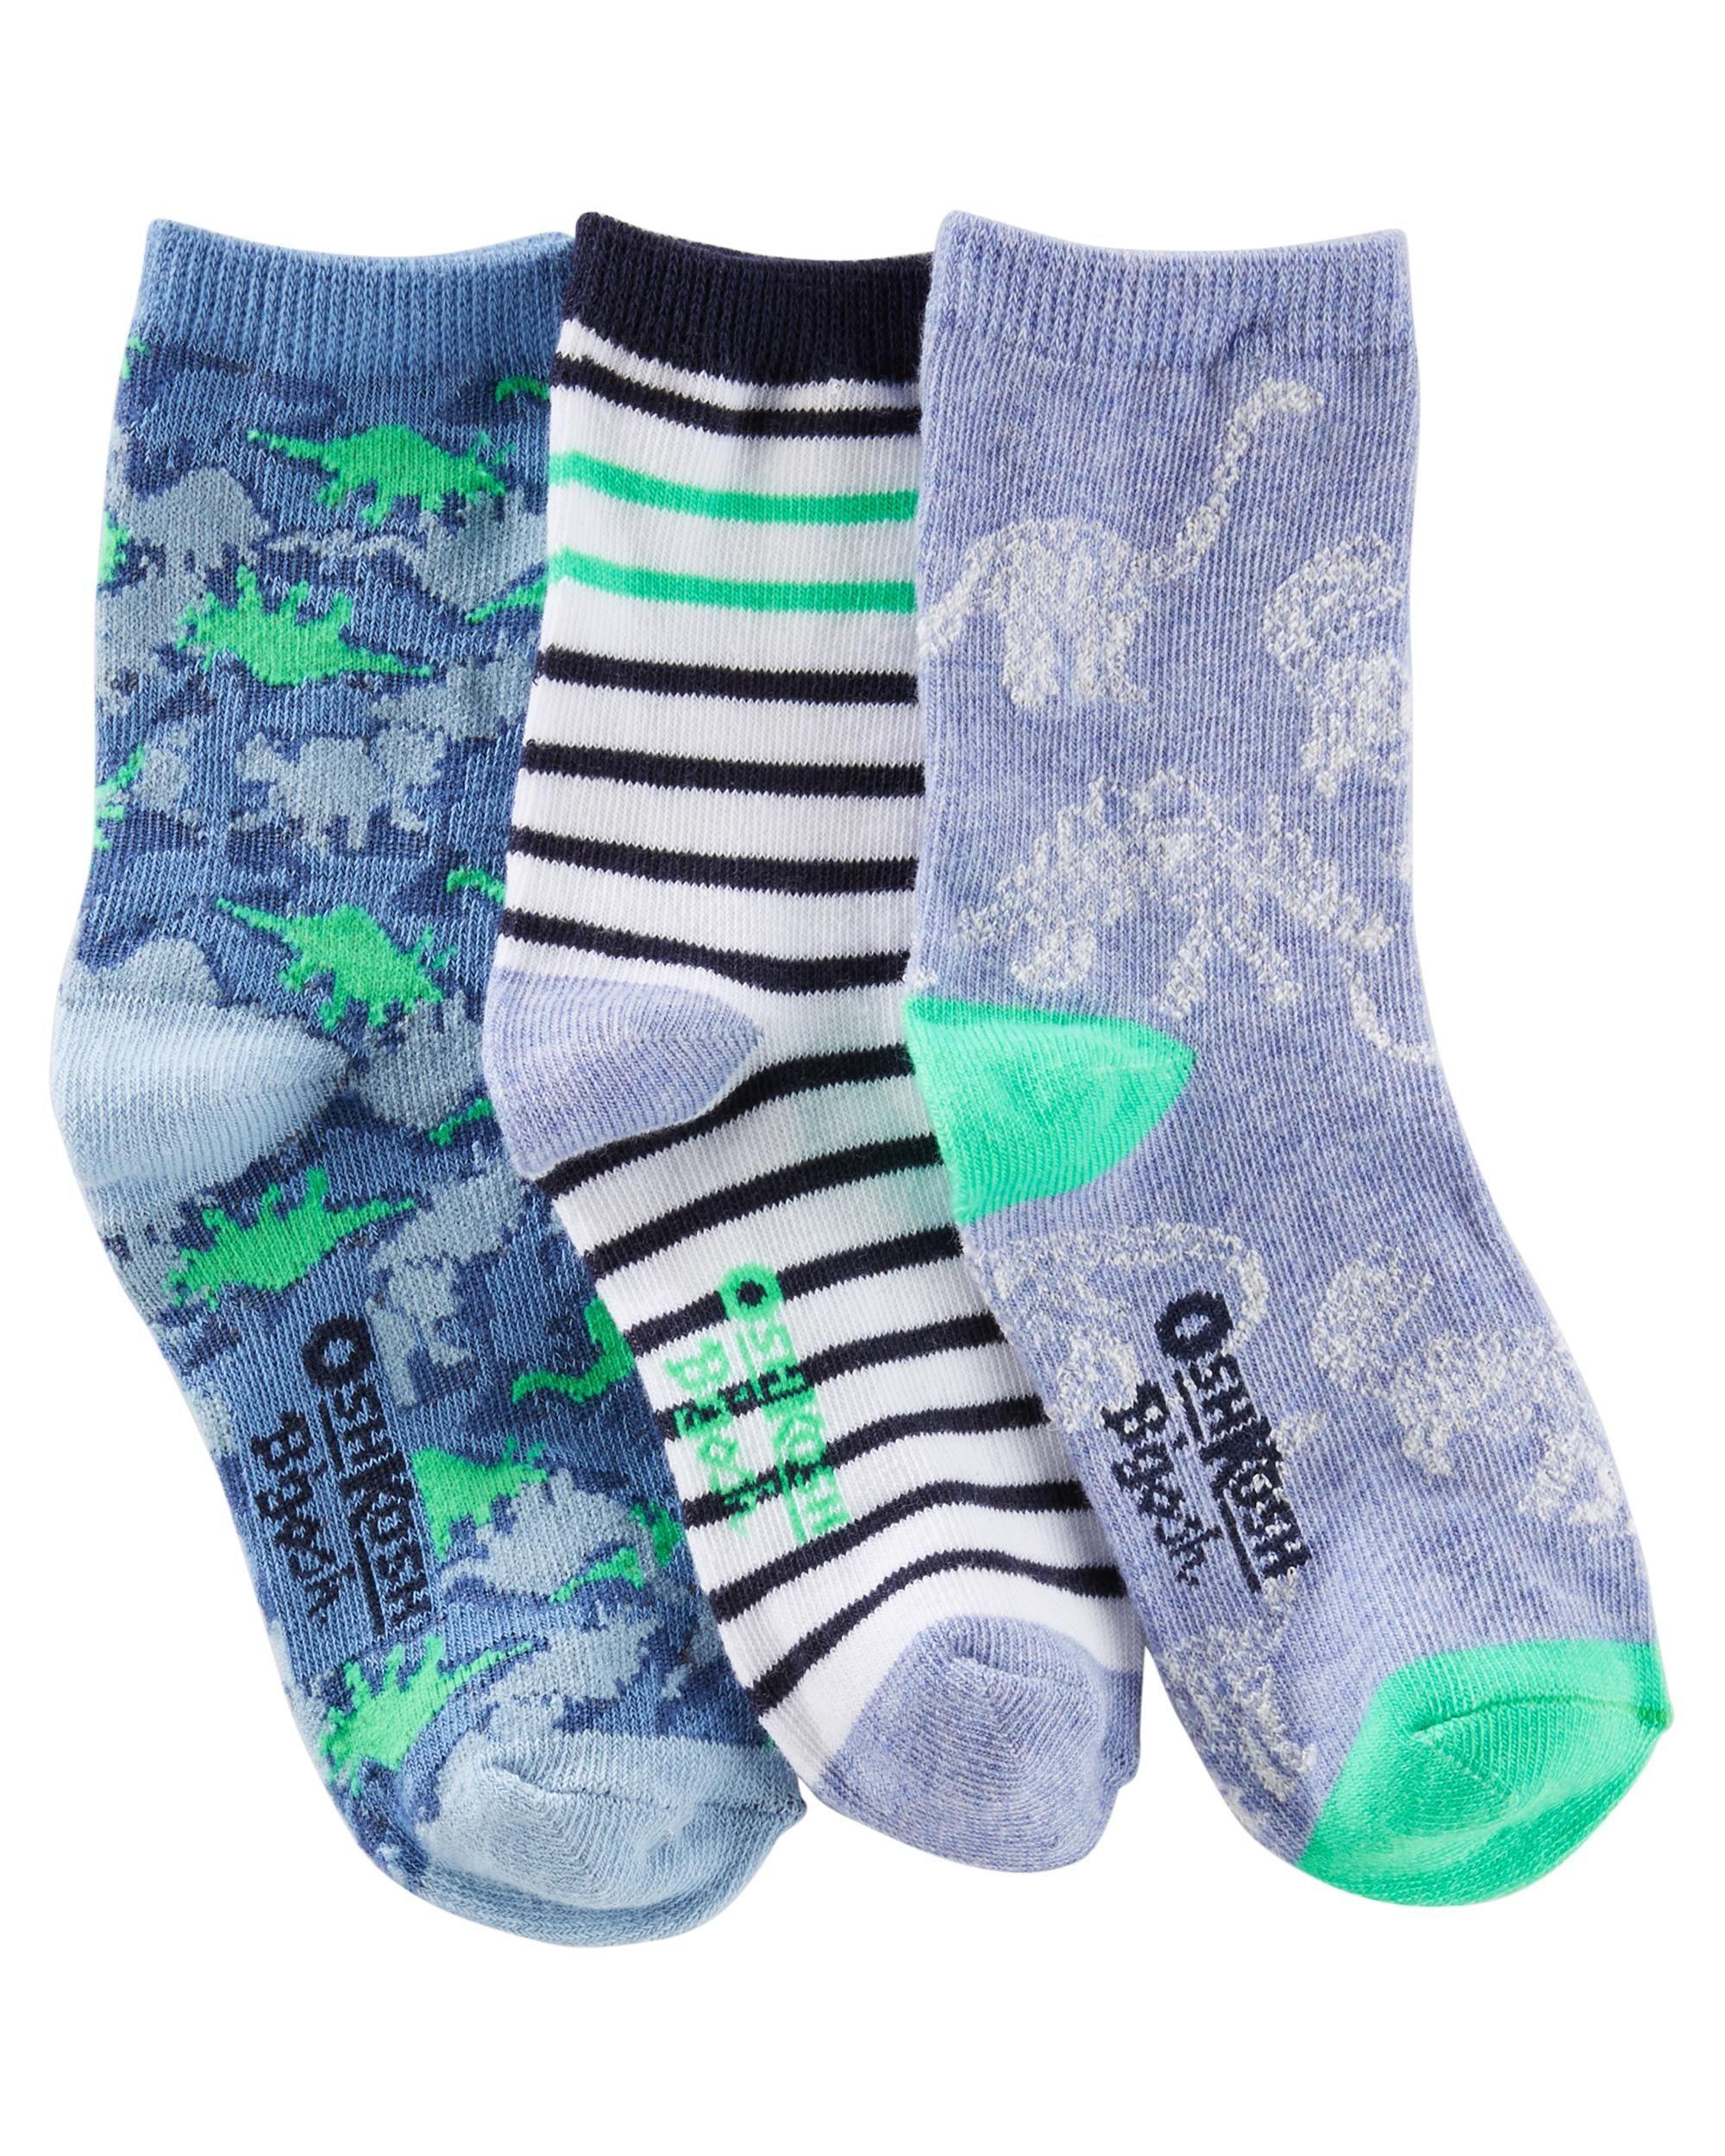 Baby Boy 3 Pack Boys Glowing Dino Crew Socks OshKosh